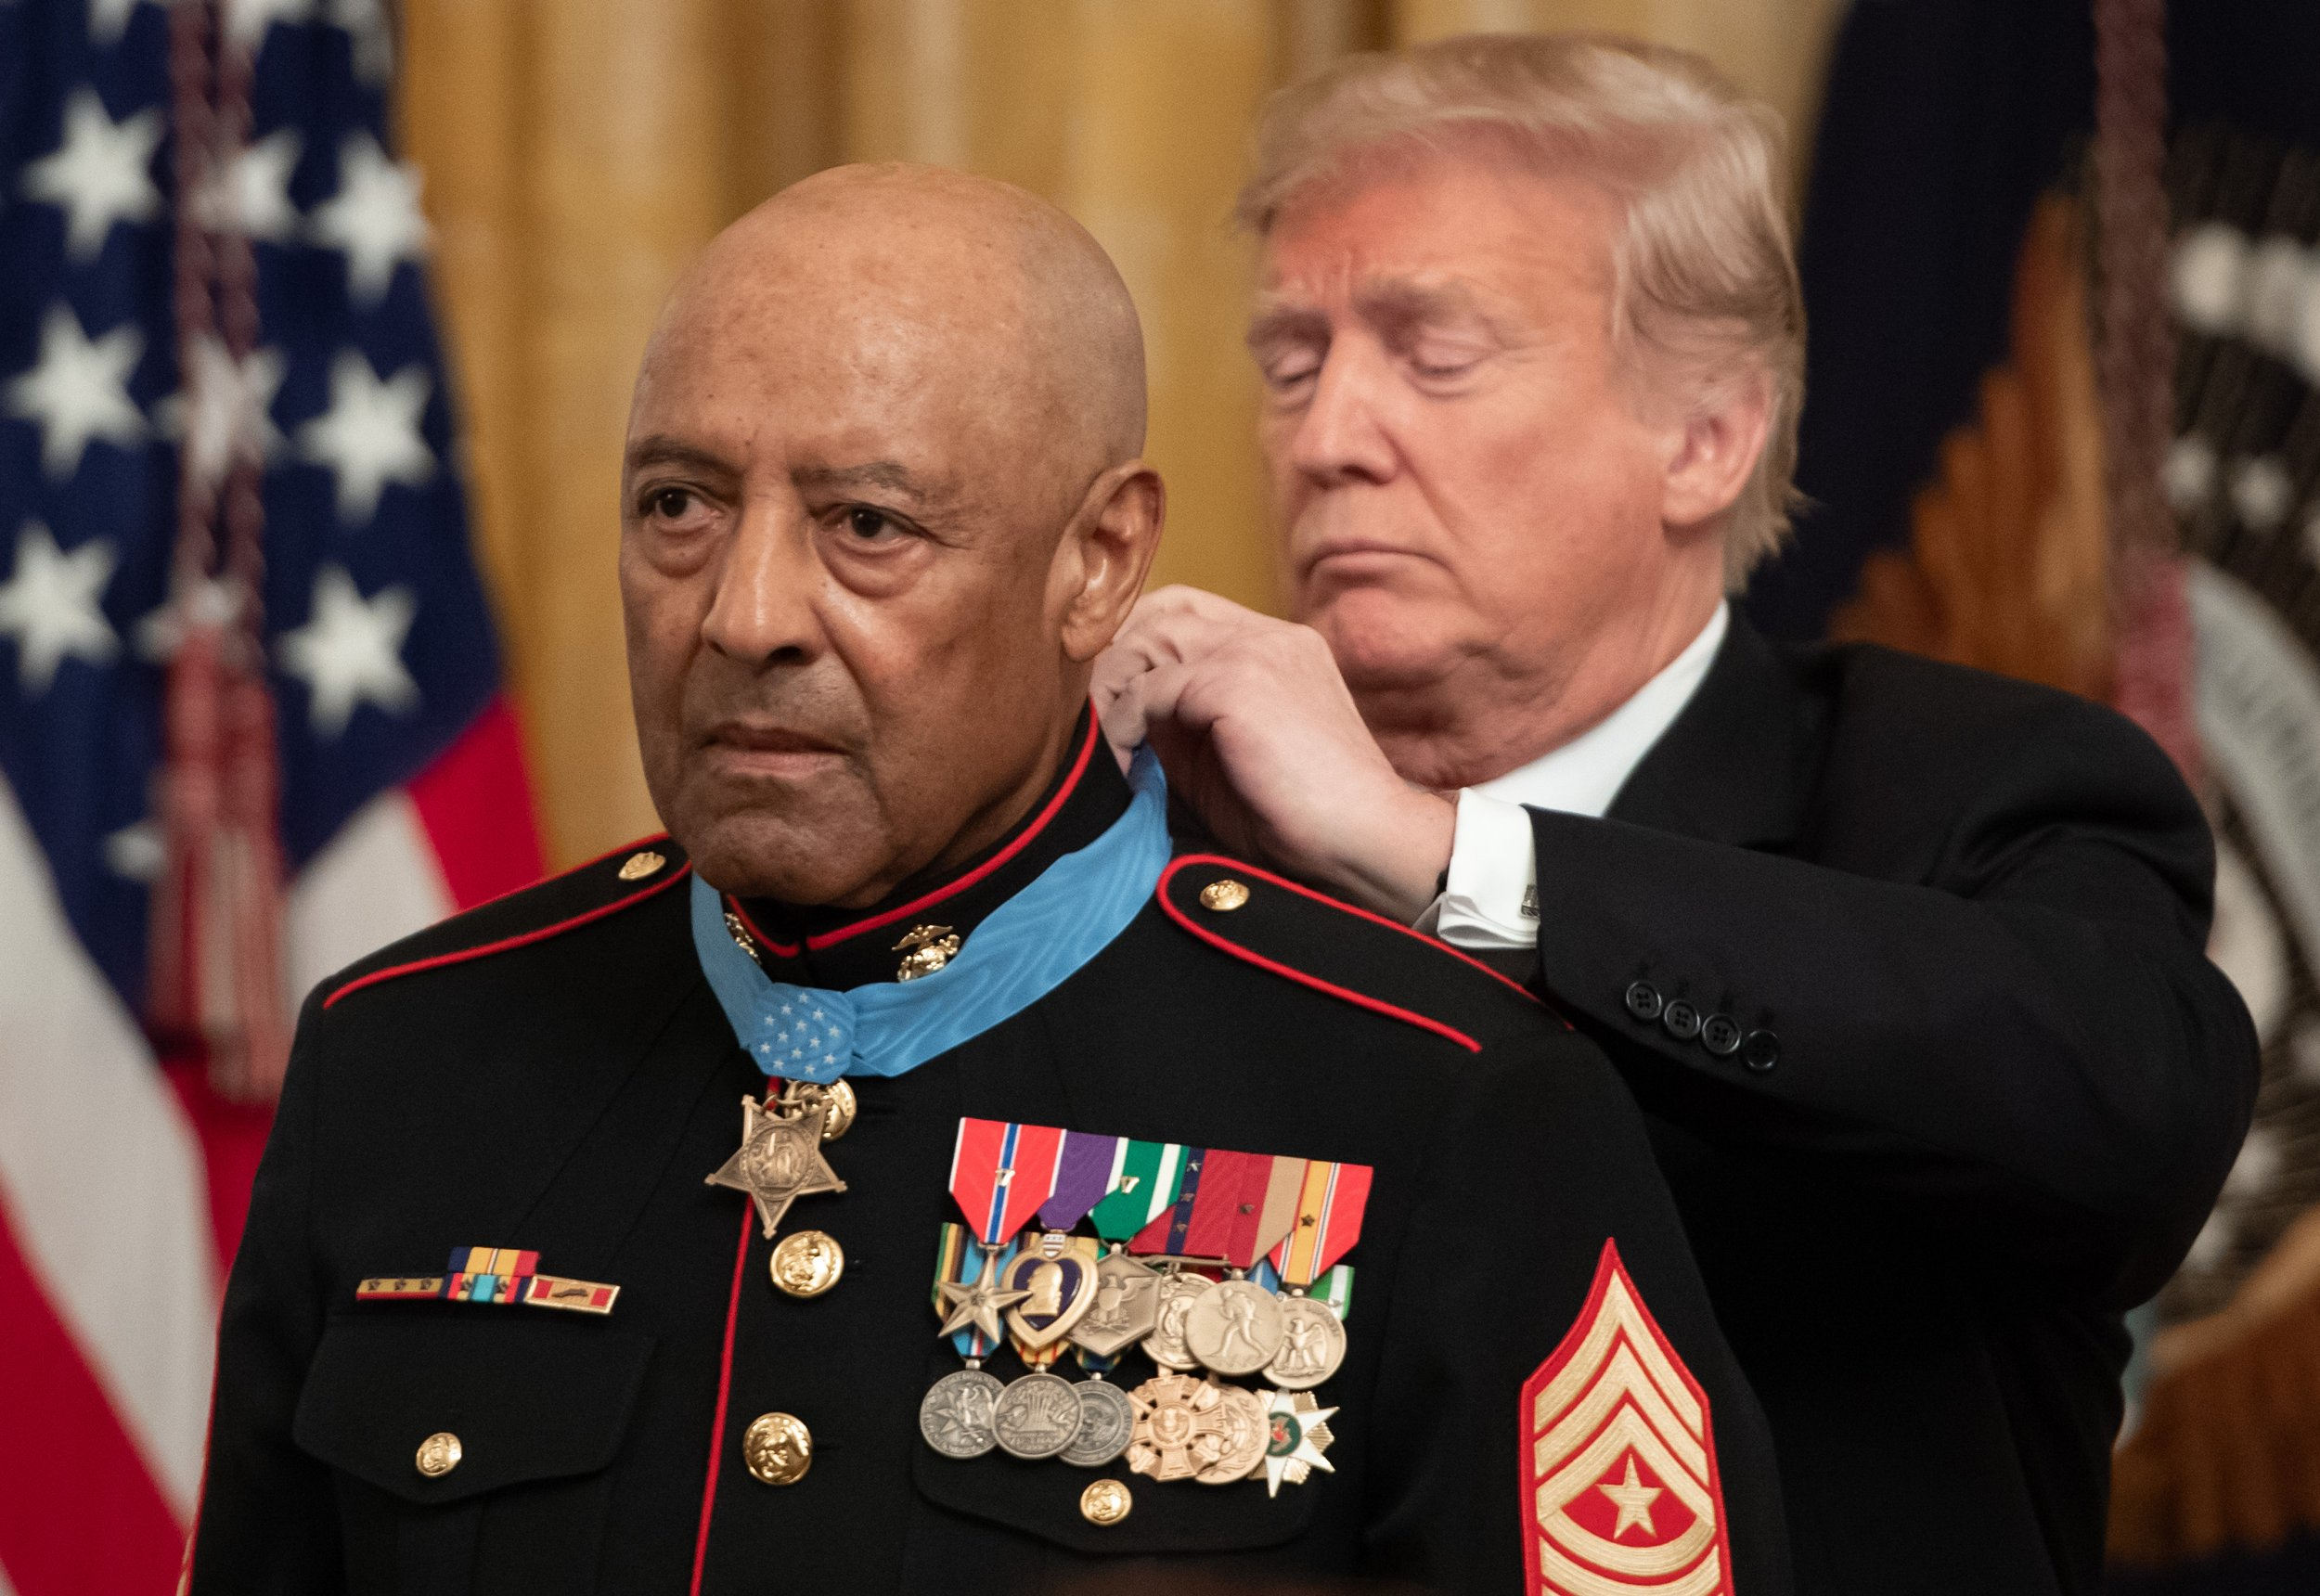 Medal of honor, John L. Canley, Donald Trump